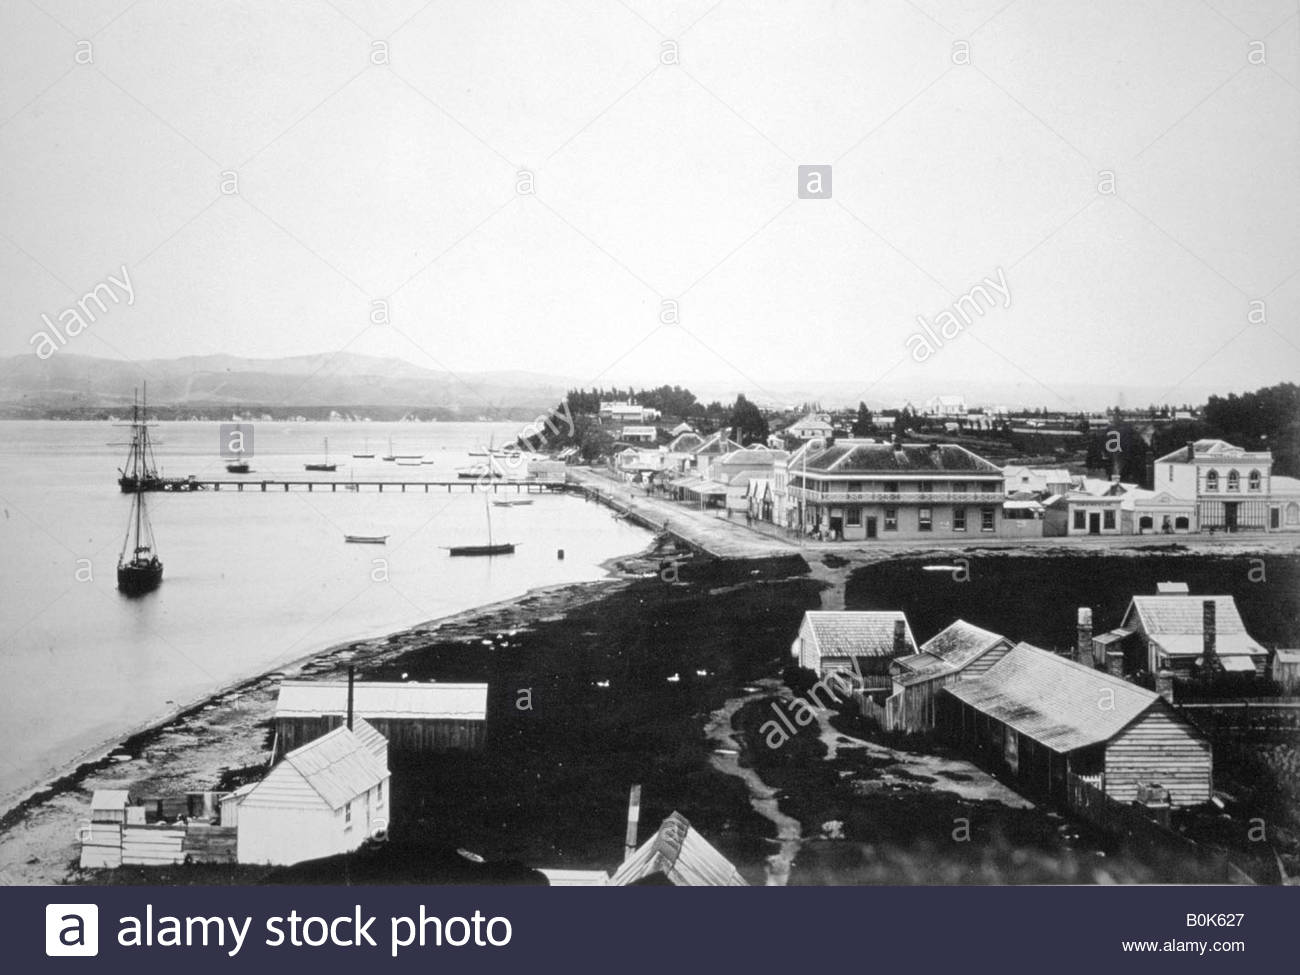 Tauranga, Bay of Plenty, North Island, New Zealand, 1875. - Stock Image